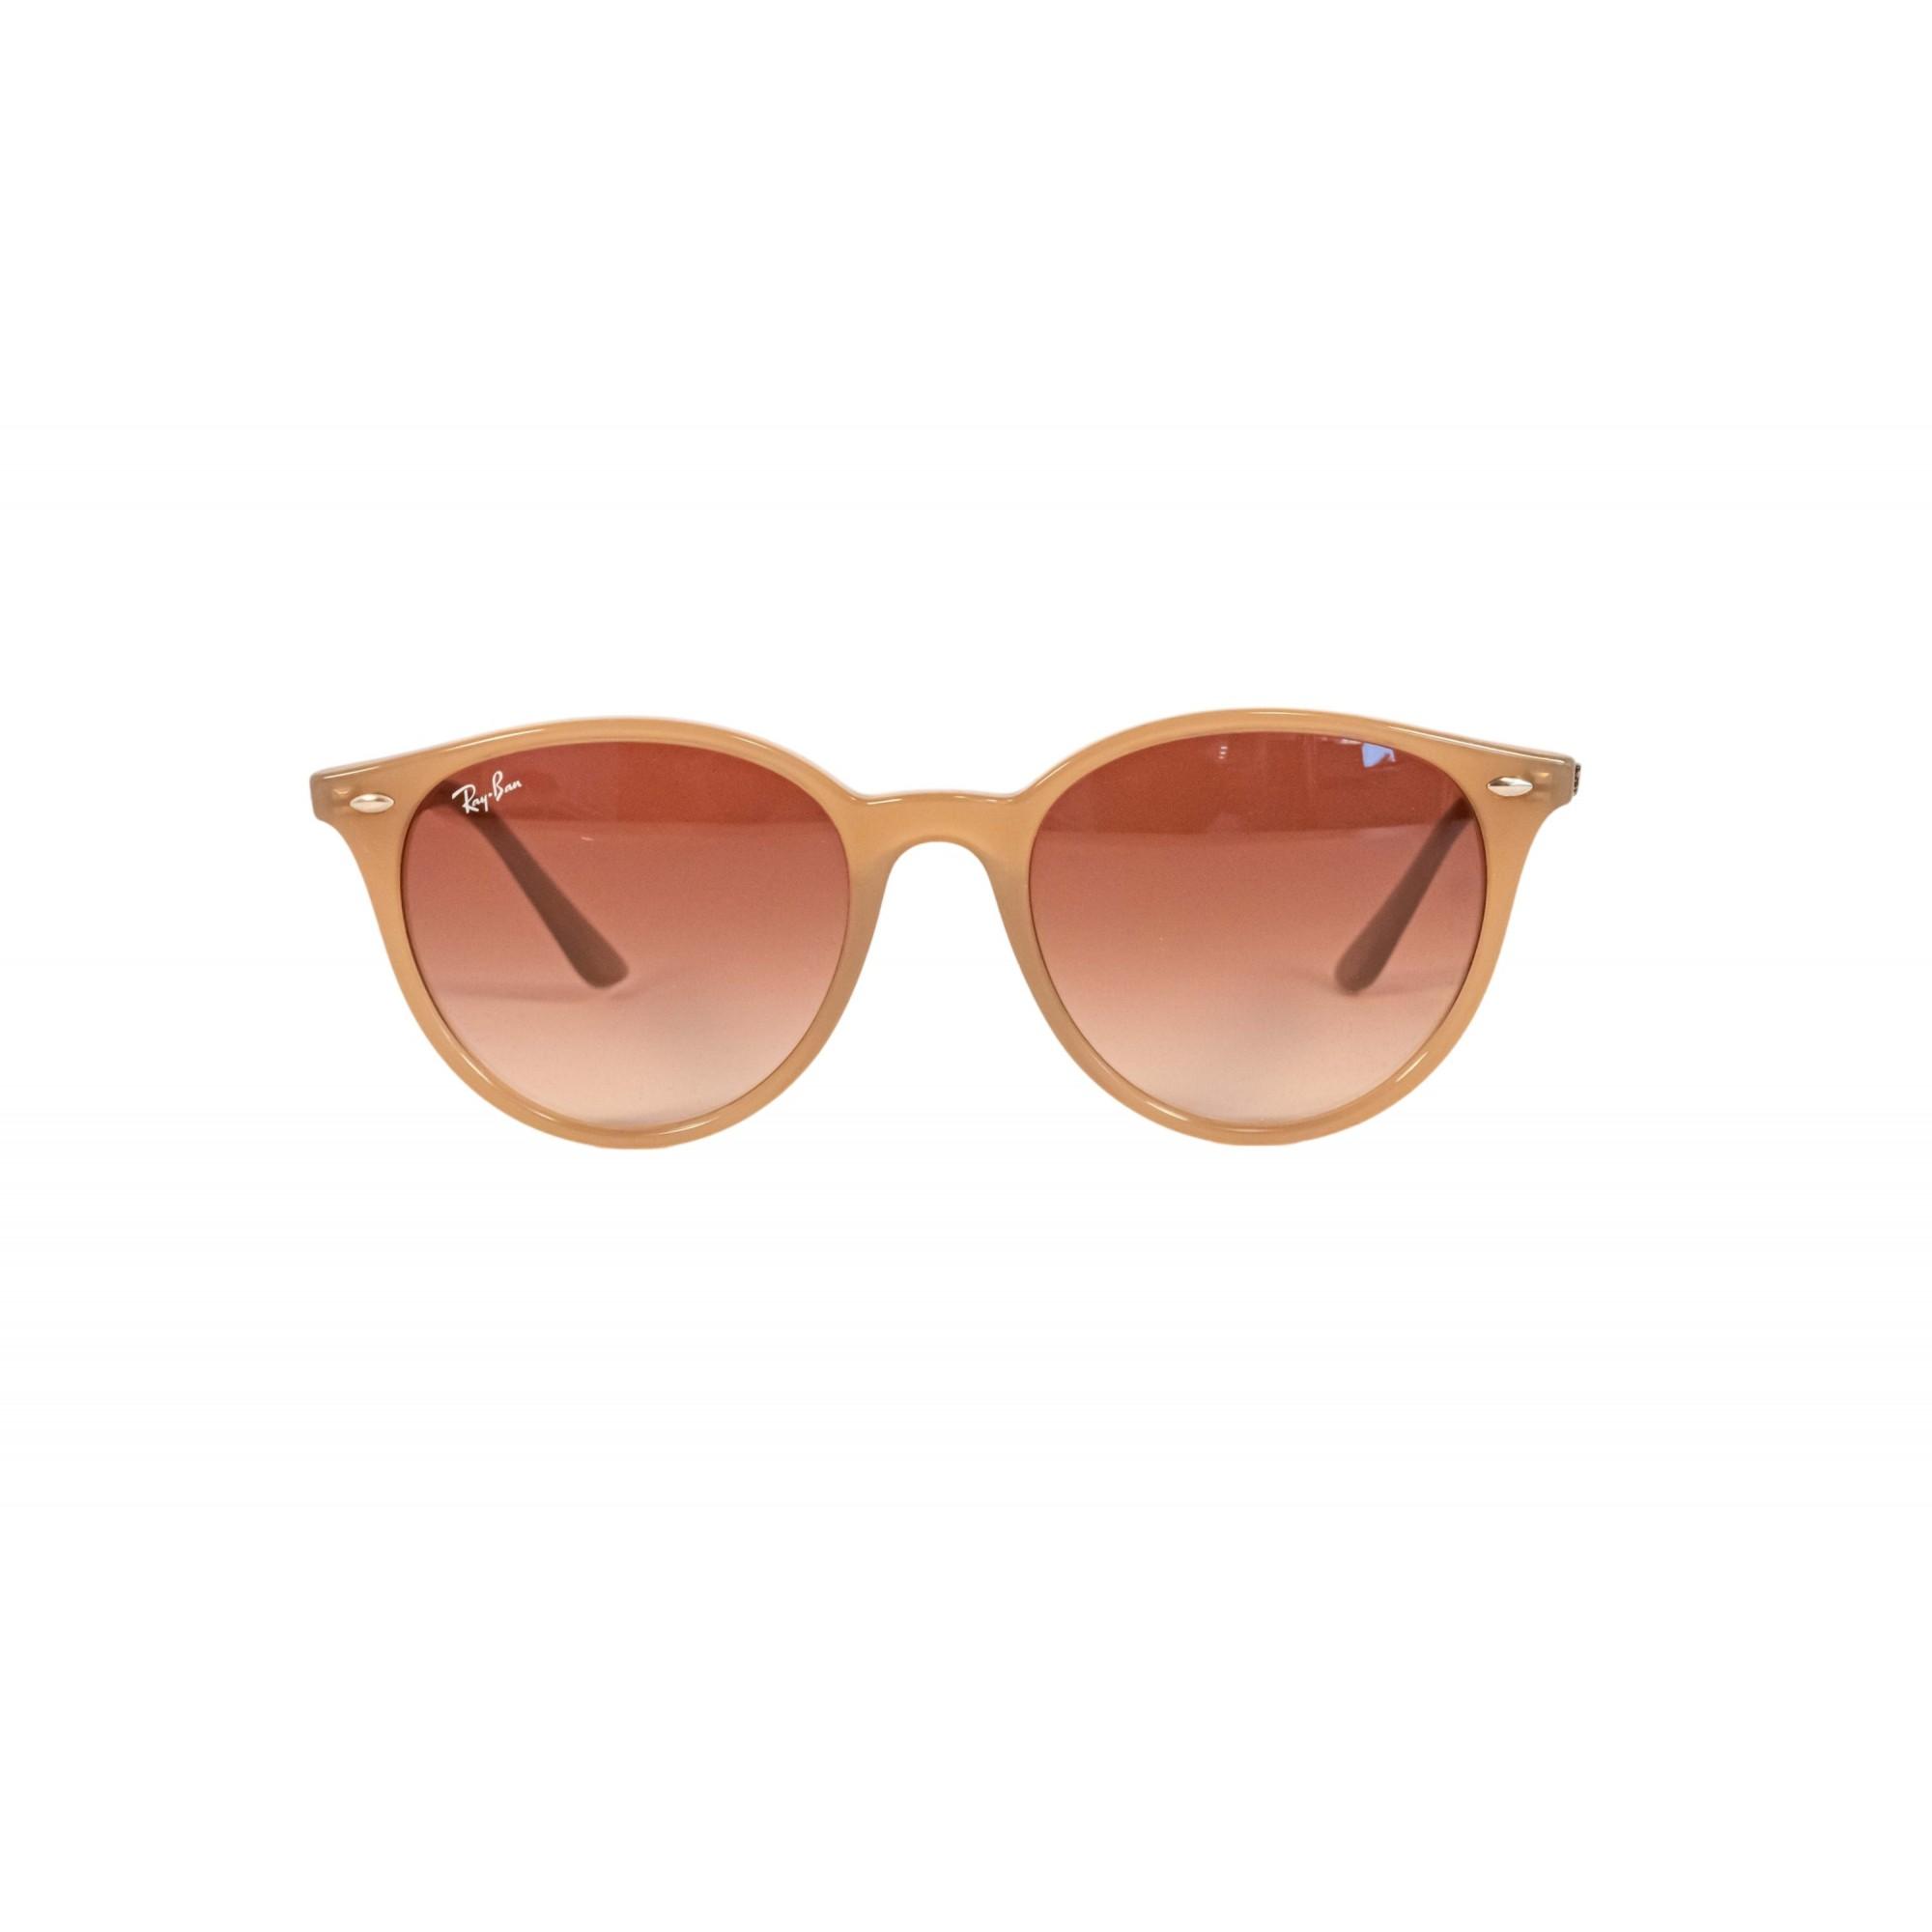 Óculos Ray Ban Redondo Rb4305 616613 53 Bege